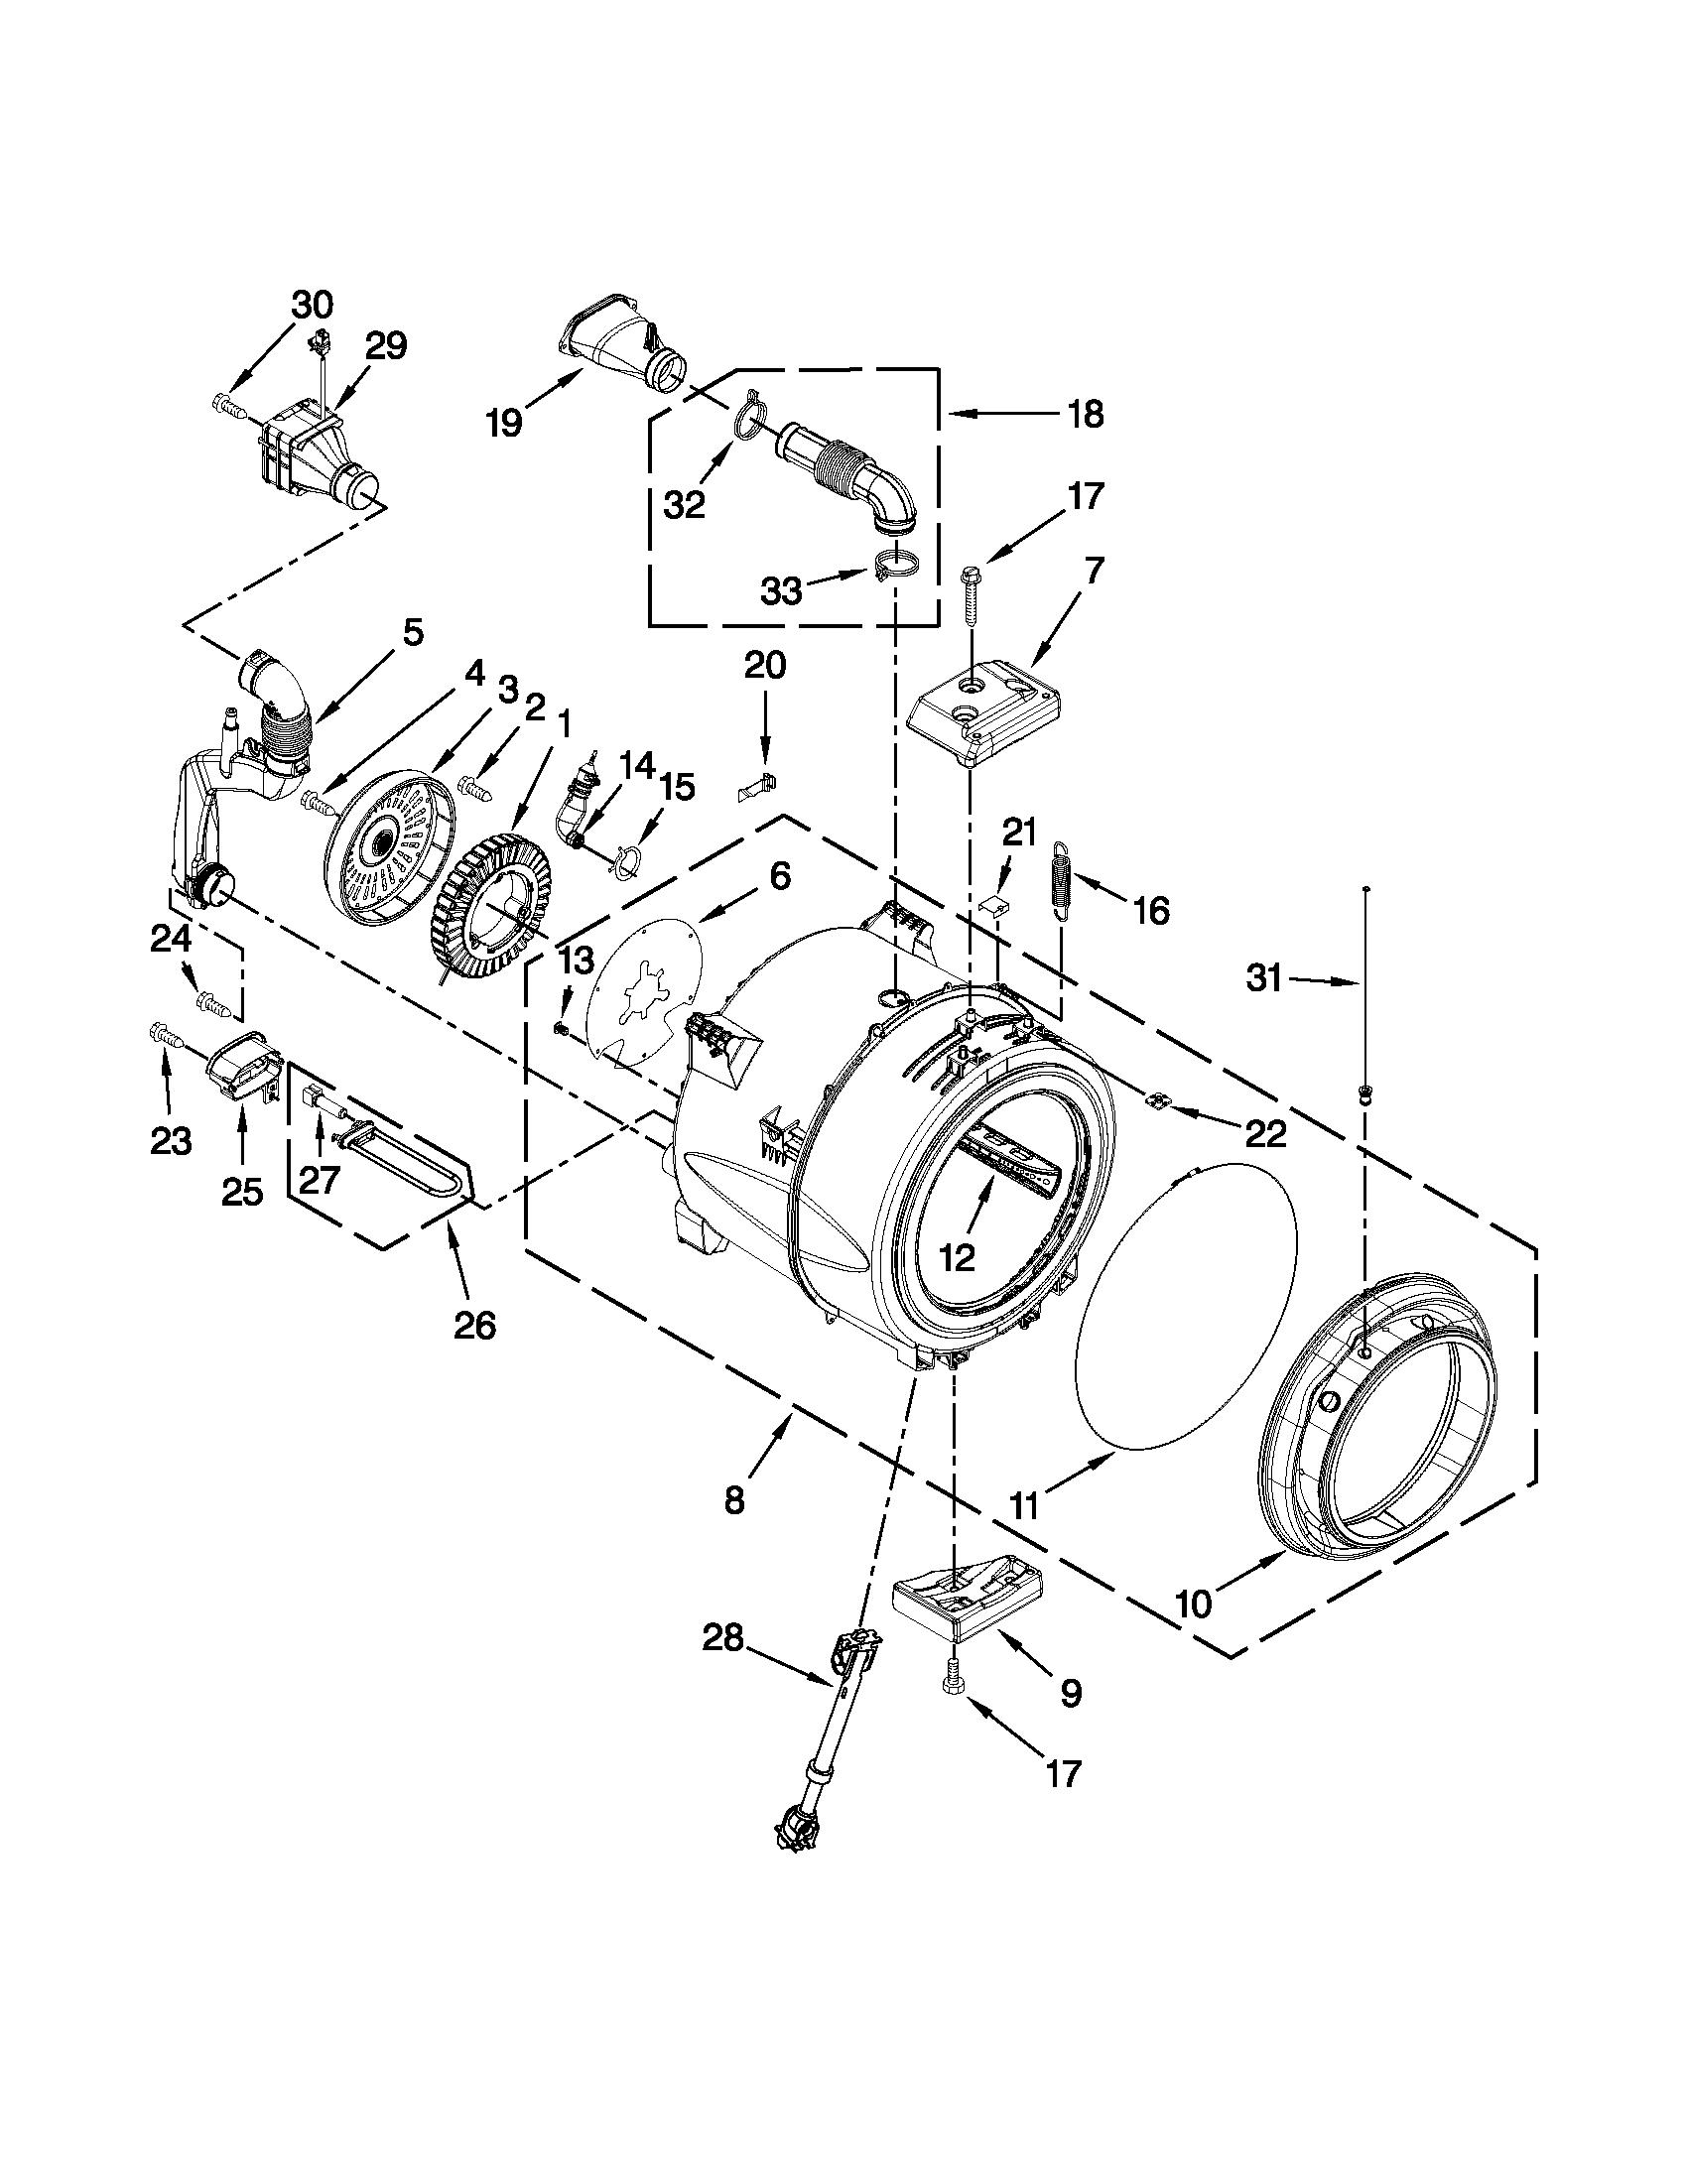 Whirlpool Washing Machine Bearing Replacement